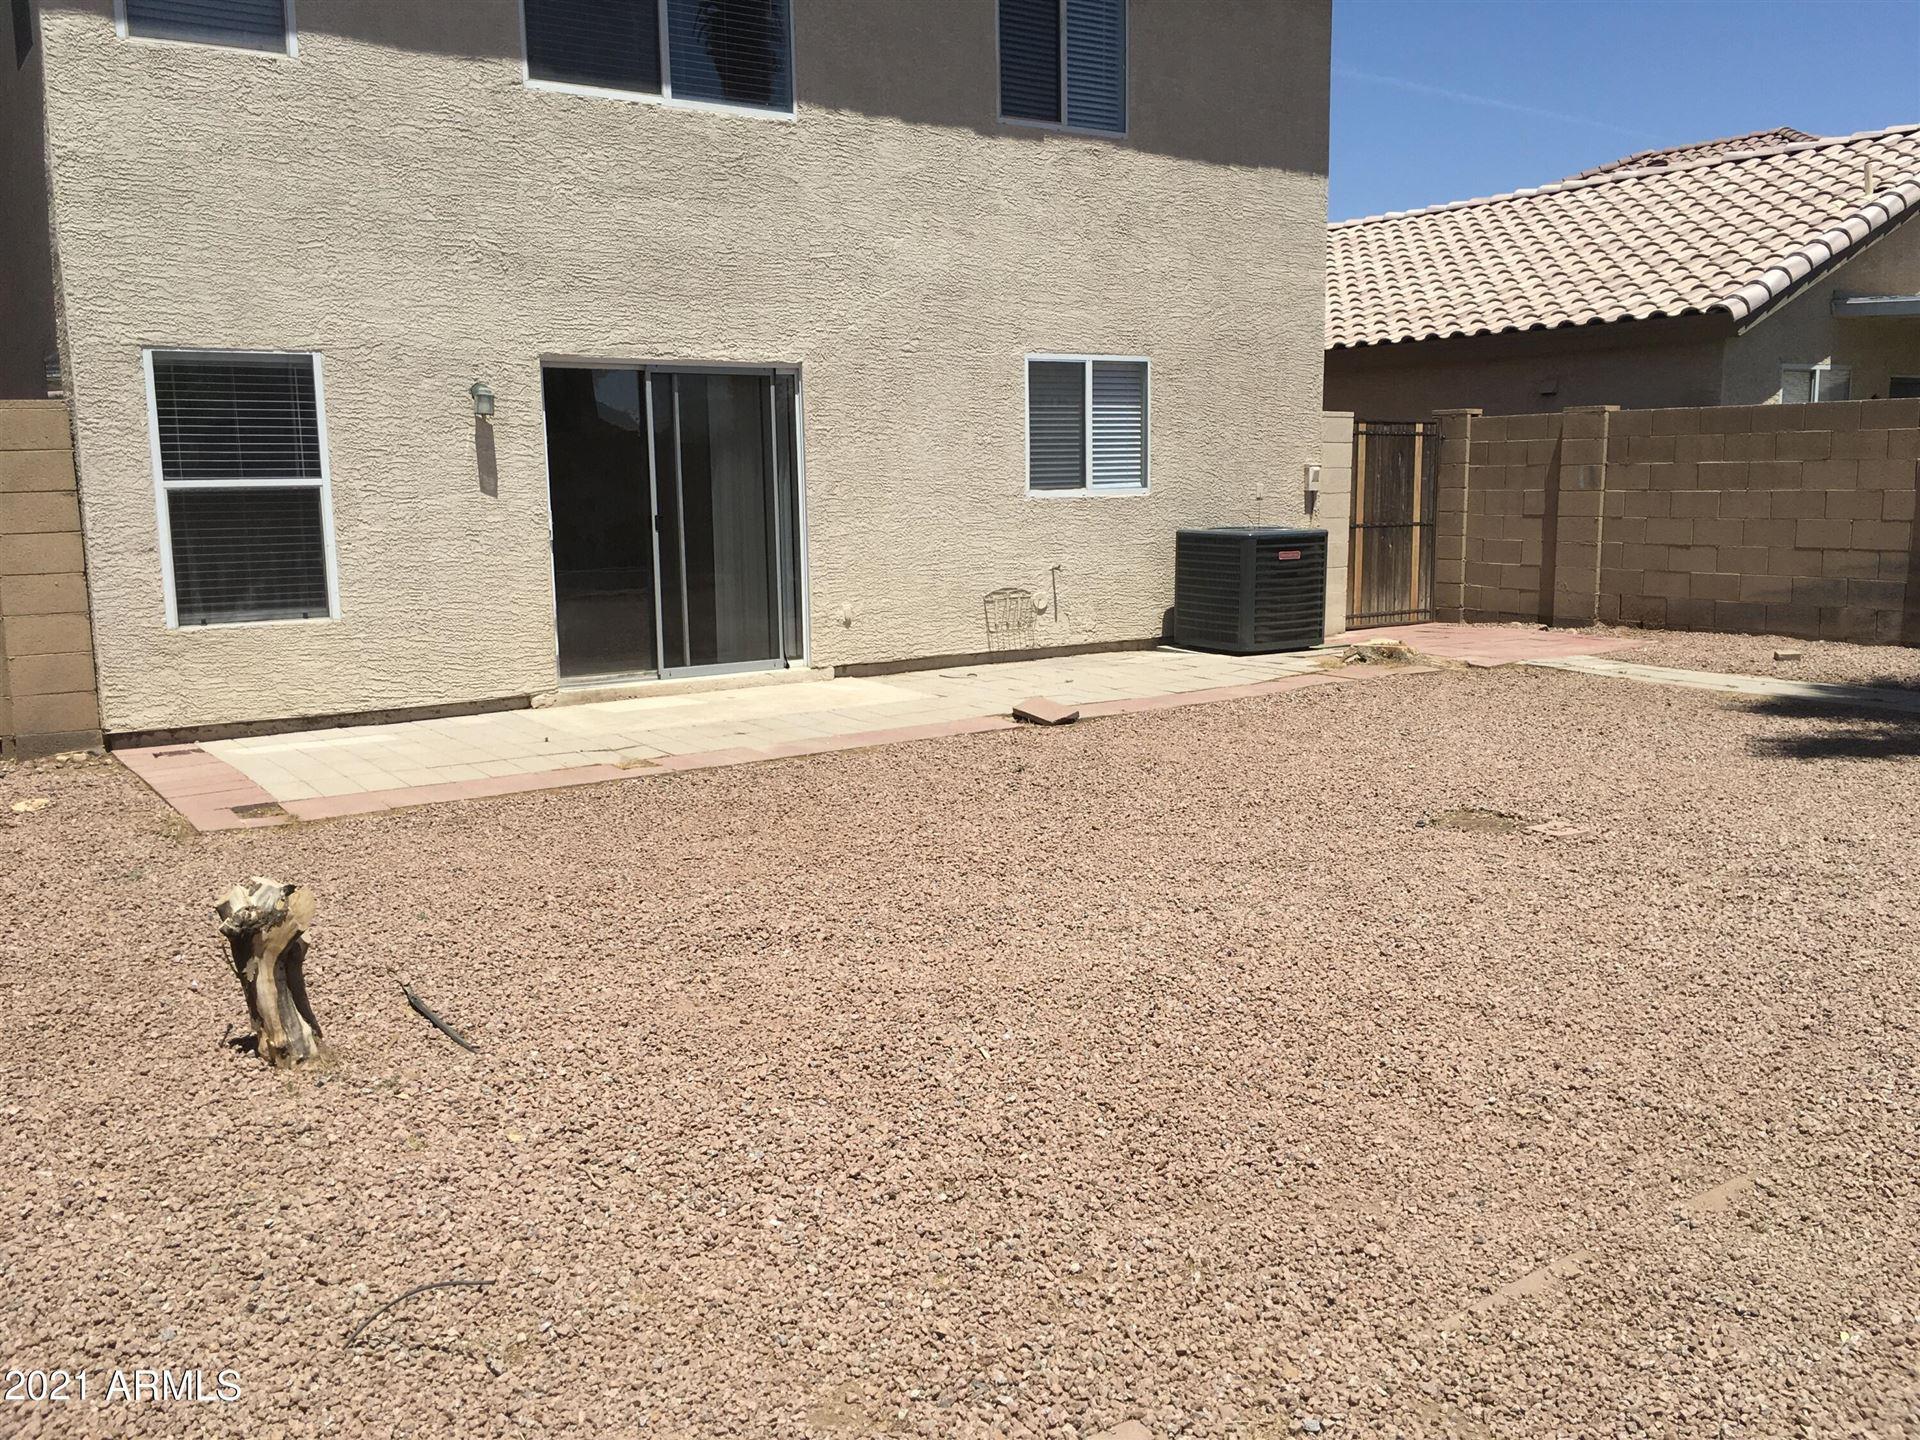 Photo of 11229 W ROMA Avenue, Phoenix, AZ 85037 (MLS # 6232195)